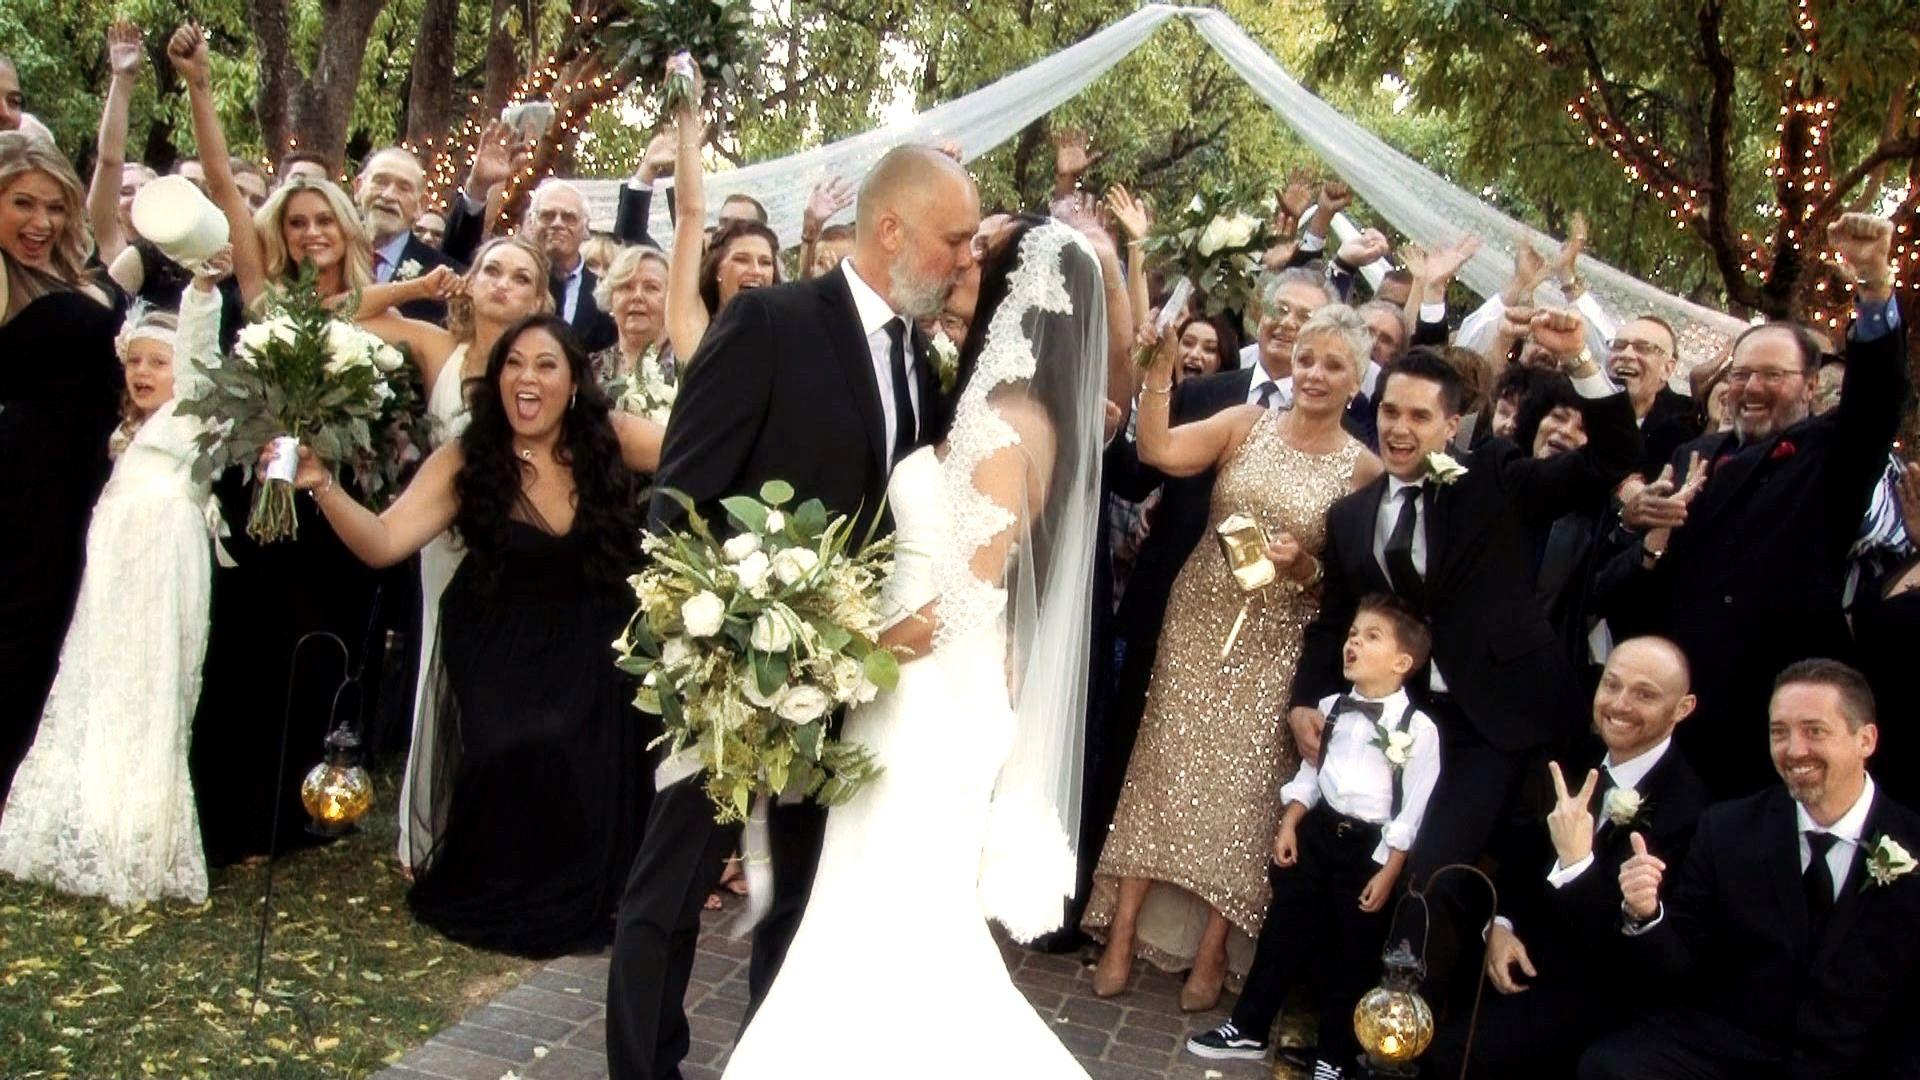 The Grove Las Vegas Wedding (With images) Vegas